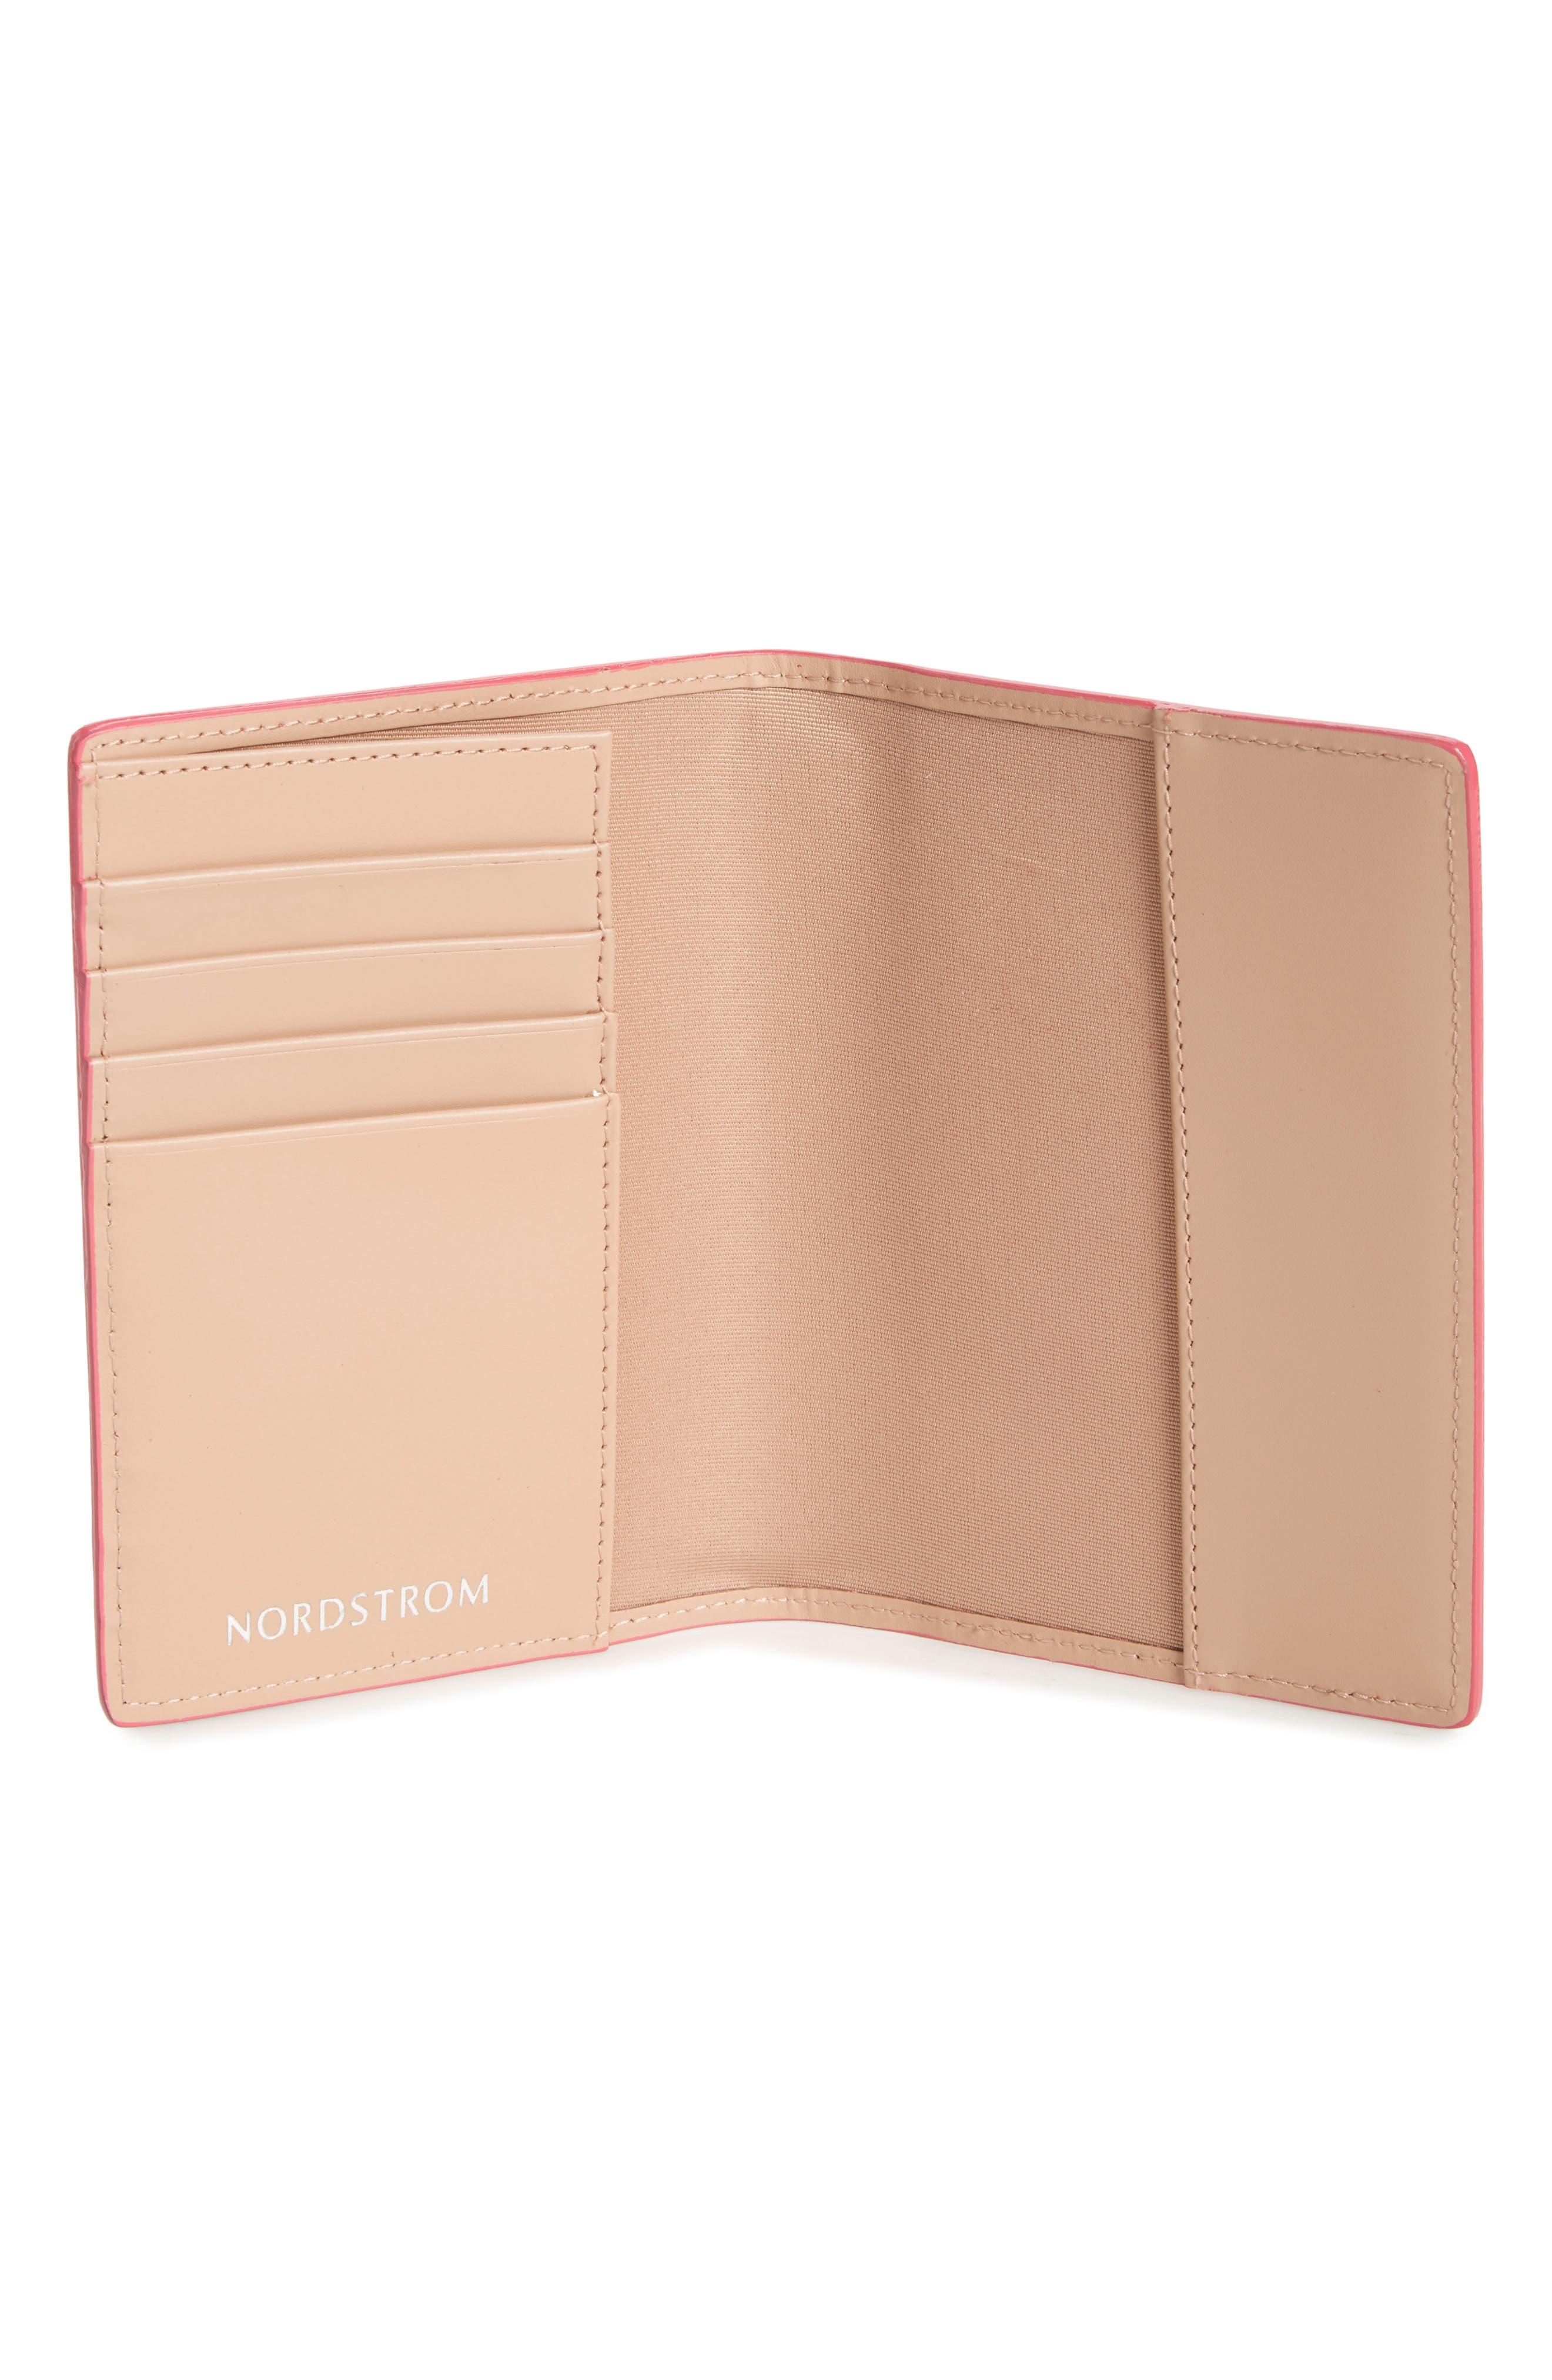 Leather Passport Case,                             Alternate thumbnail 3, color,                             Pink Rapture